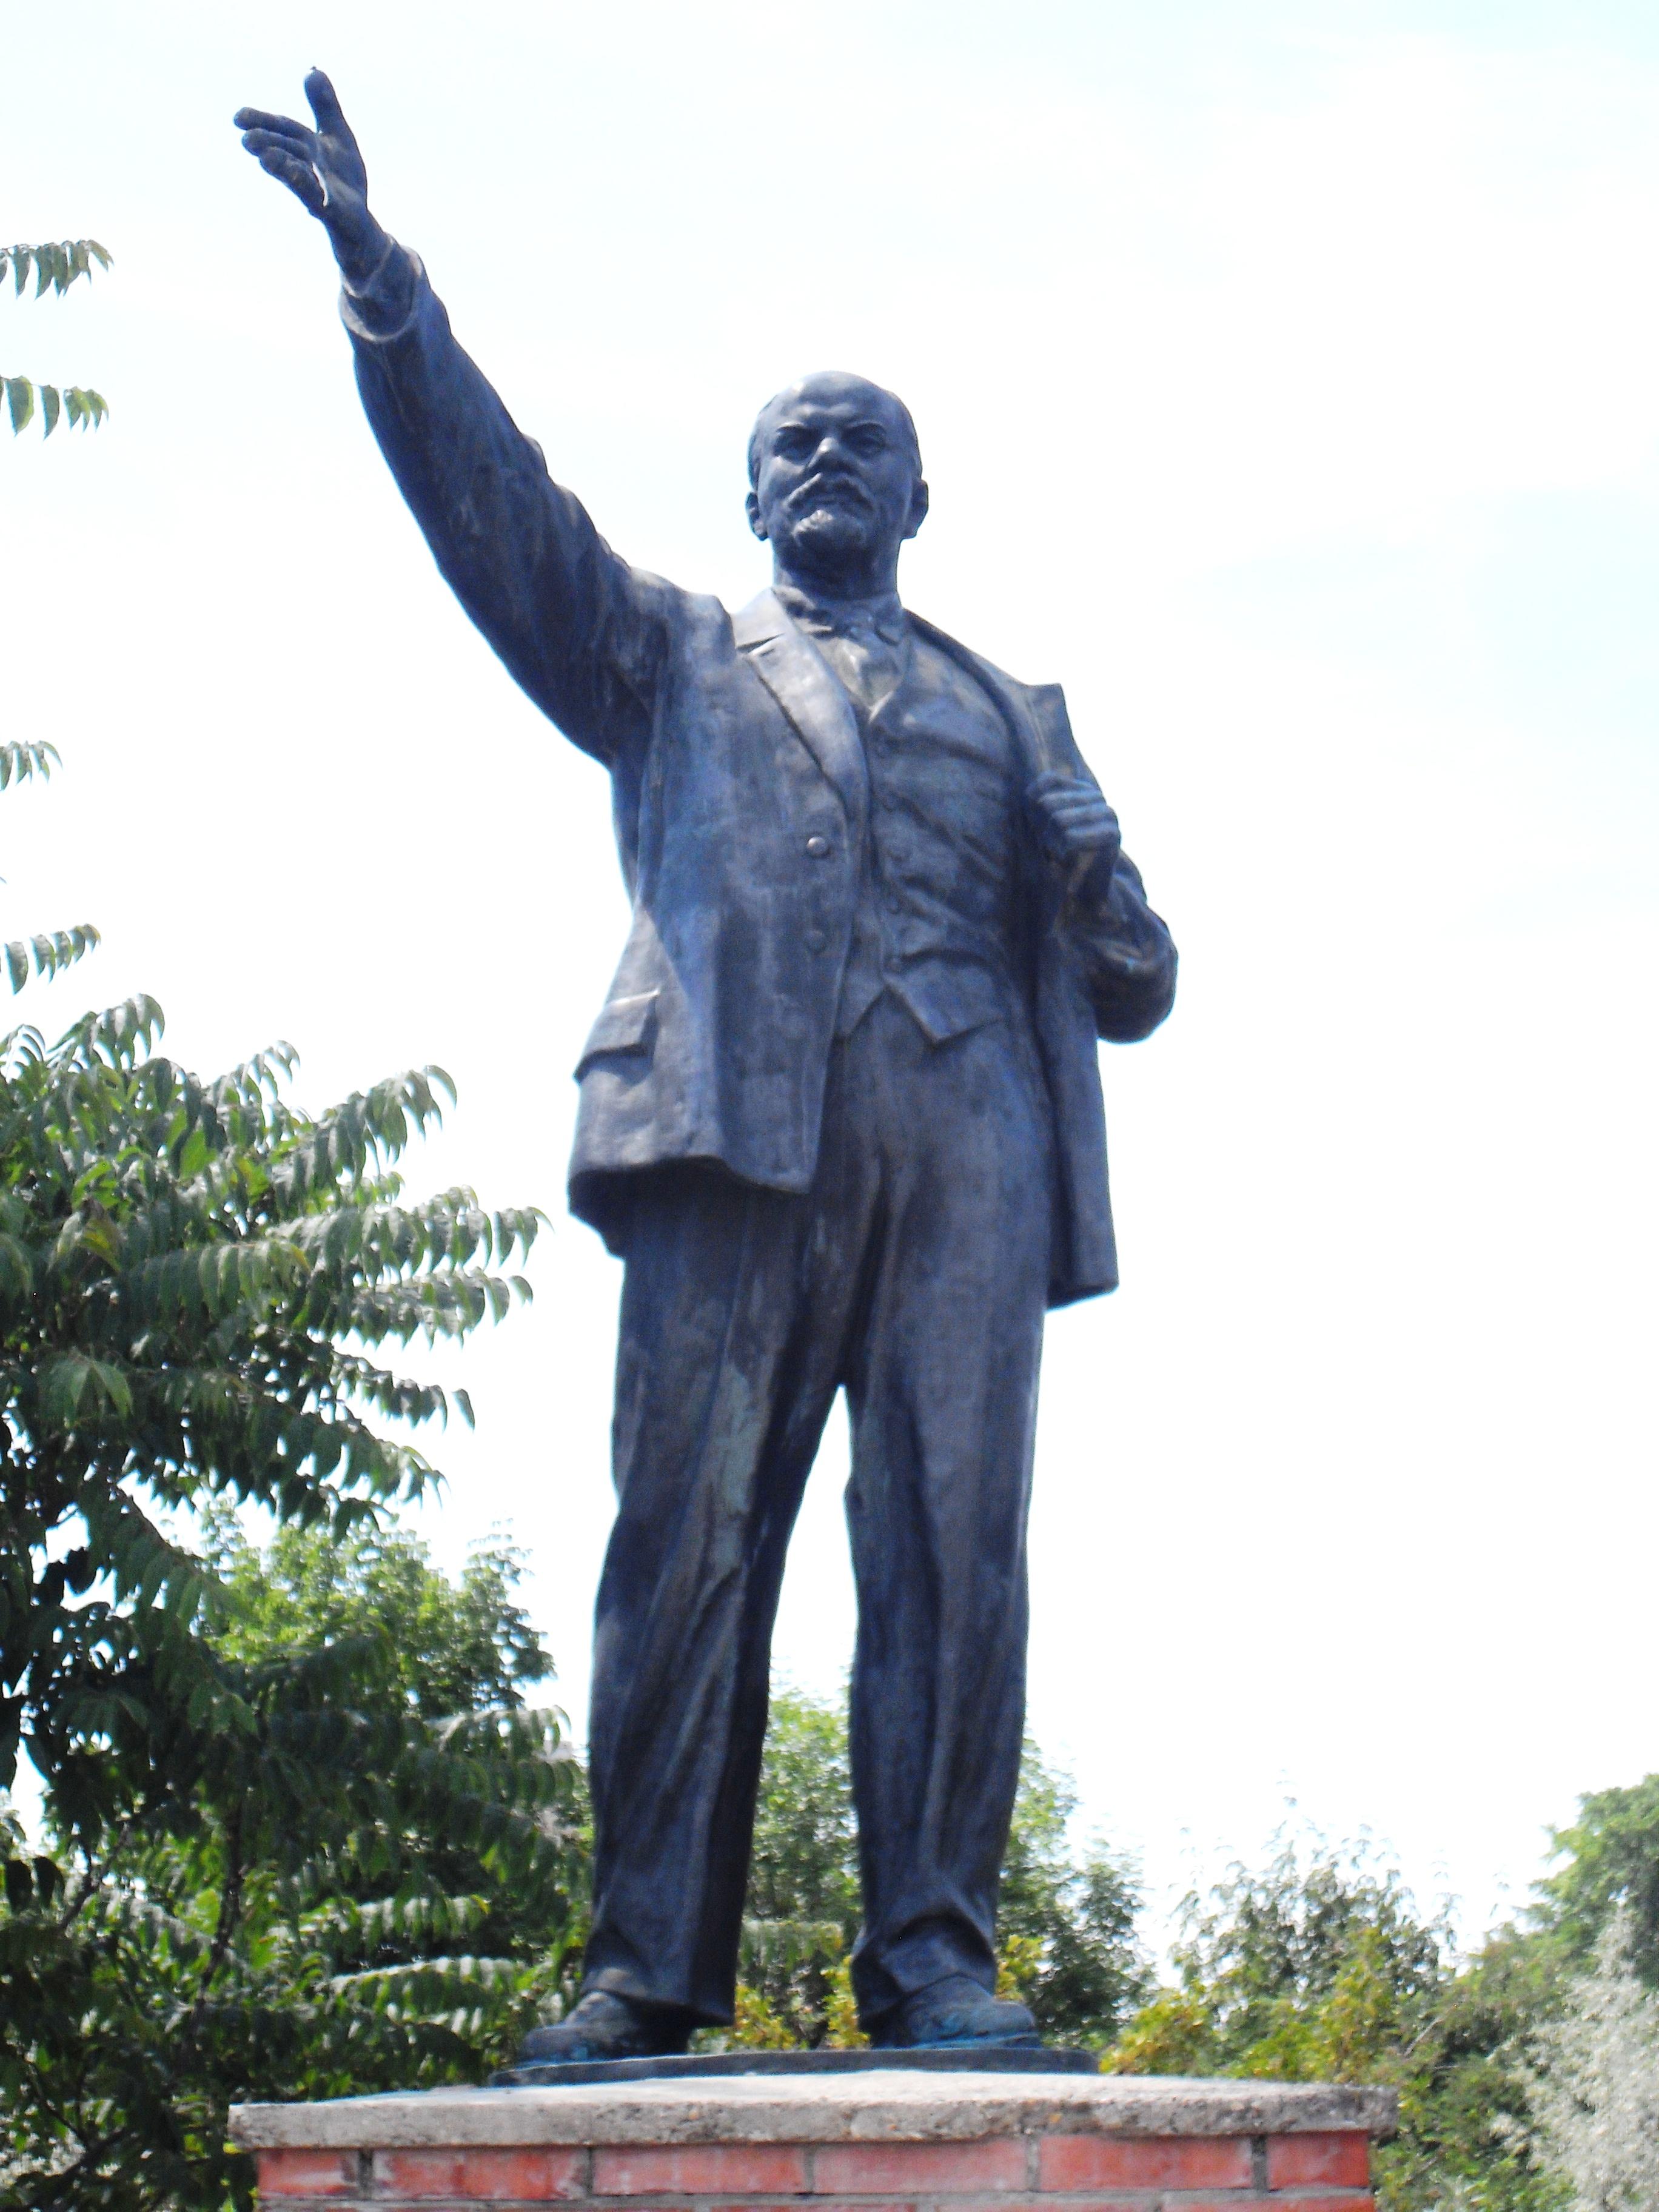 significance of vladimir lenin Vladimir lenin: founder of the russian communist party, leader of the bolshevik revolution of 1917, and first head of the soviet state.